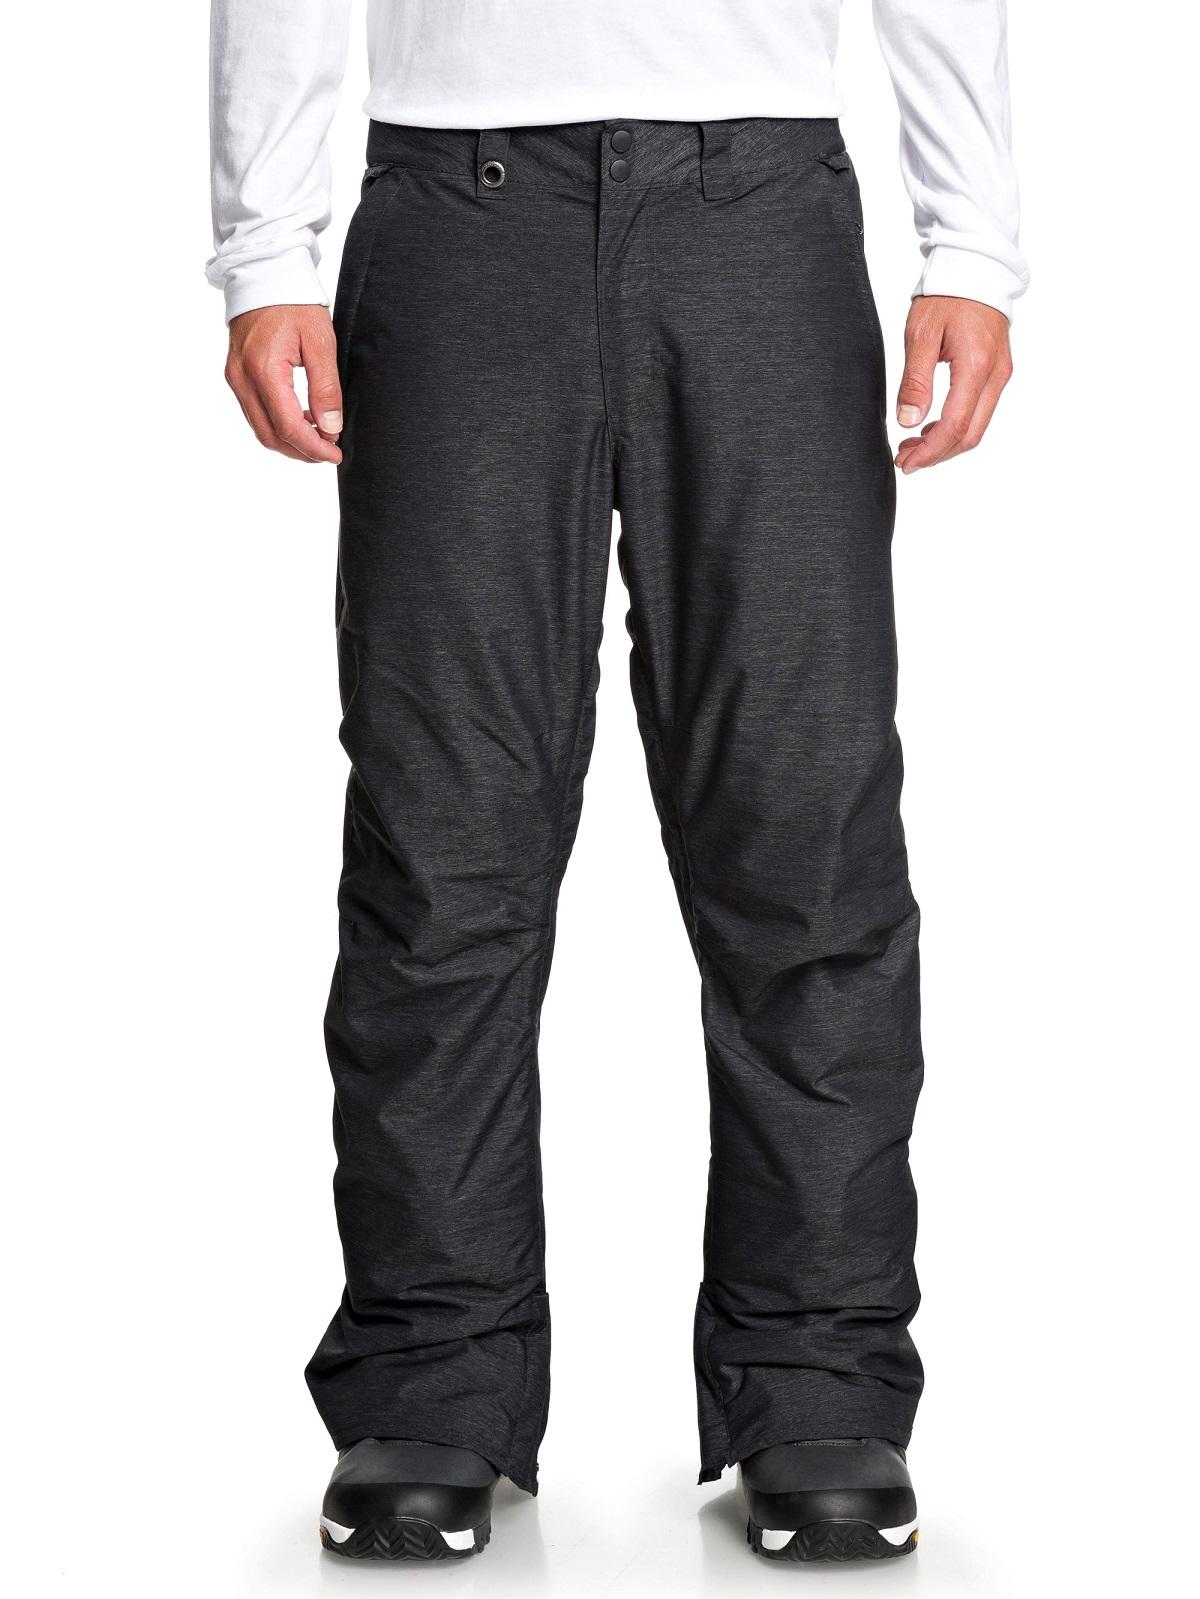 Kalhoty lyžařské pánské QUIKSILVER ESTATE TEXT PT